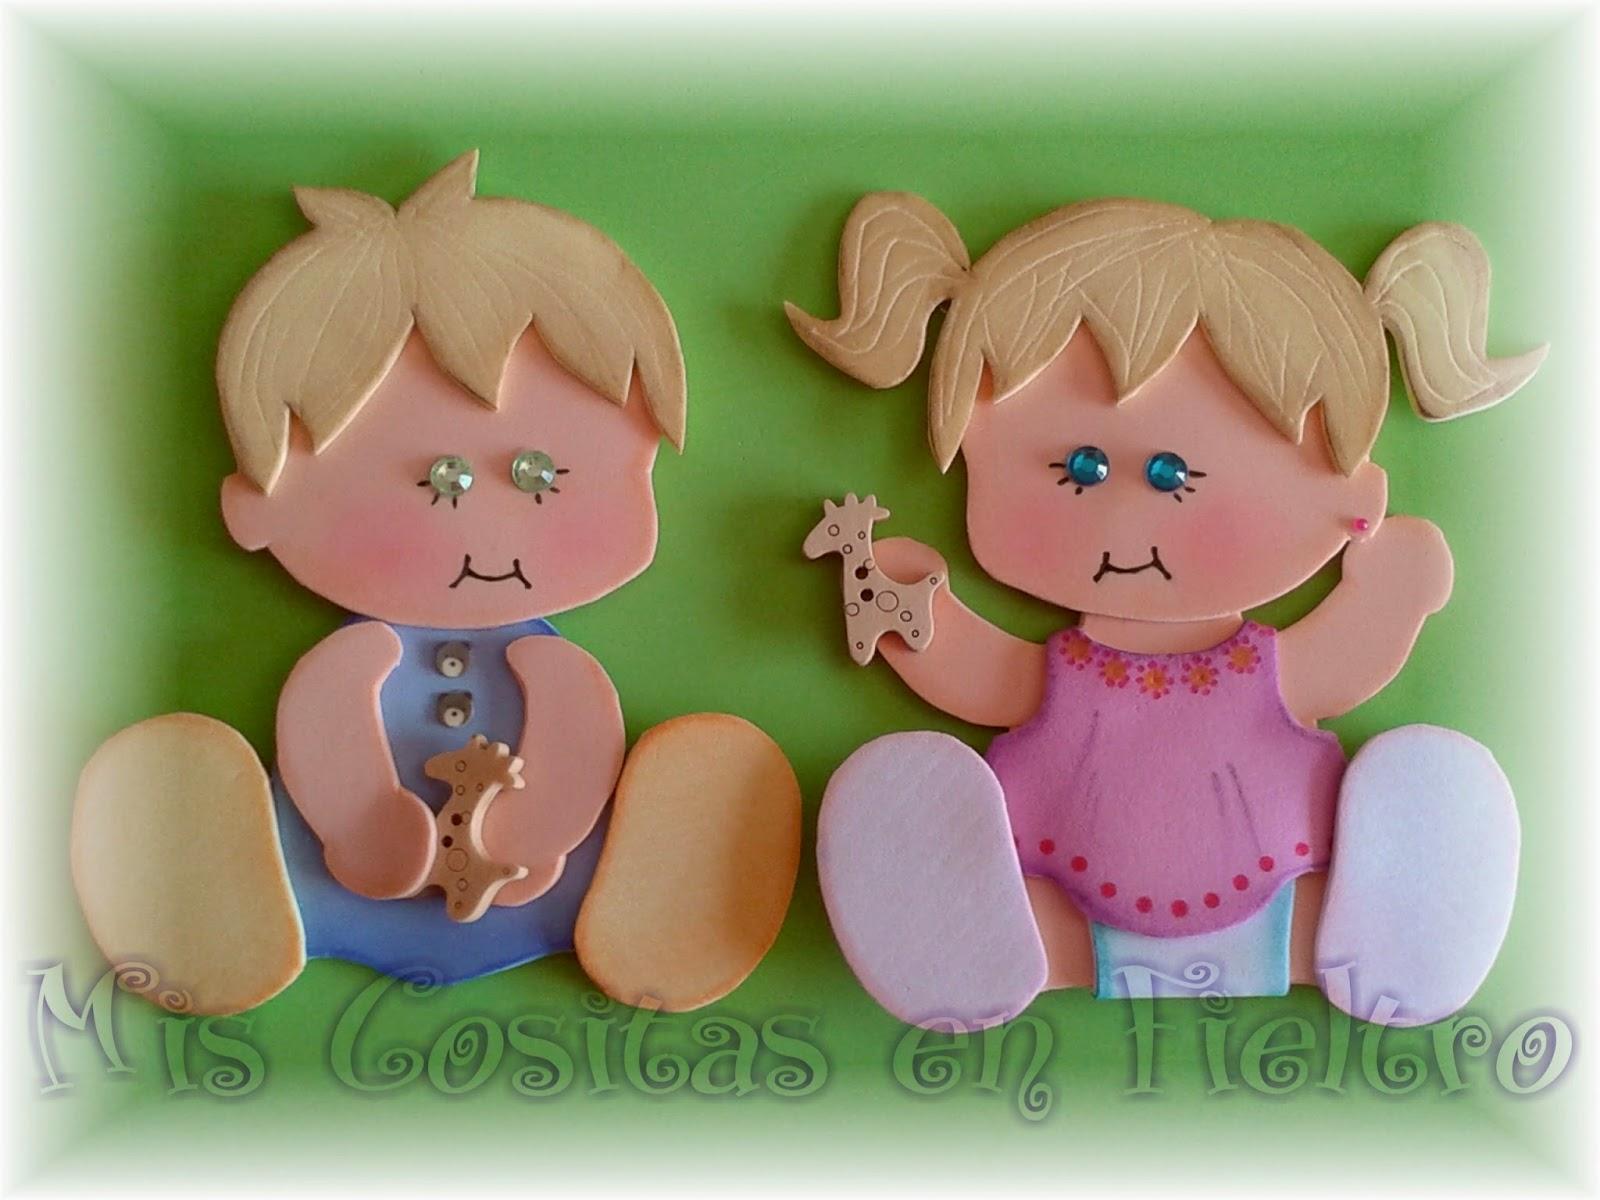 niño, niña, bebé, aplique, goma eva, jugando, foami